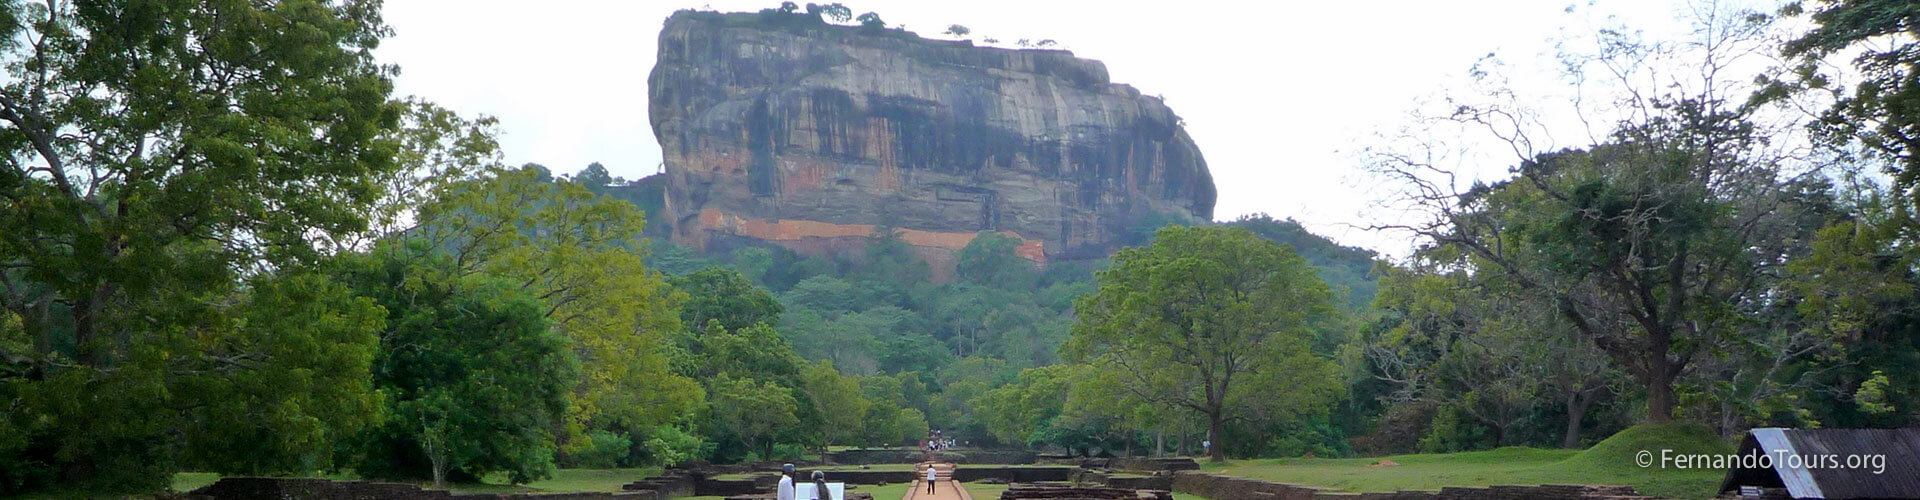 Visit Sigiriya Sri Lanka - 3 Days / 2 Nights Package Tour Sri Lanka